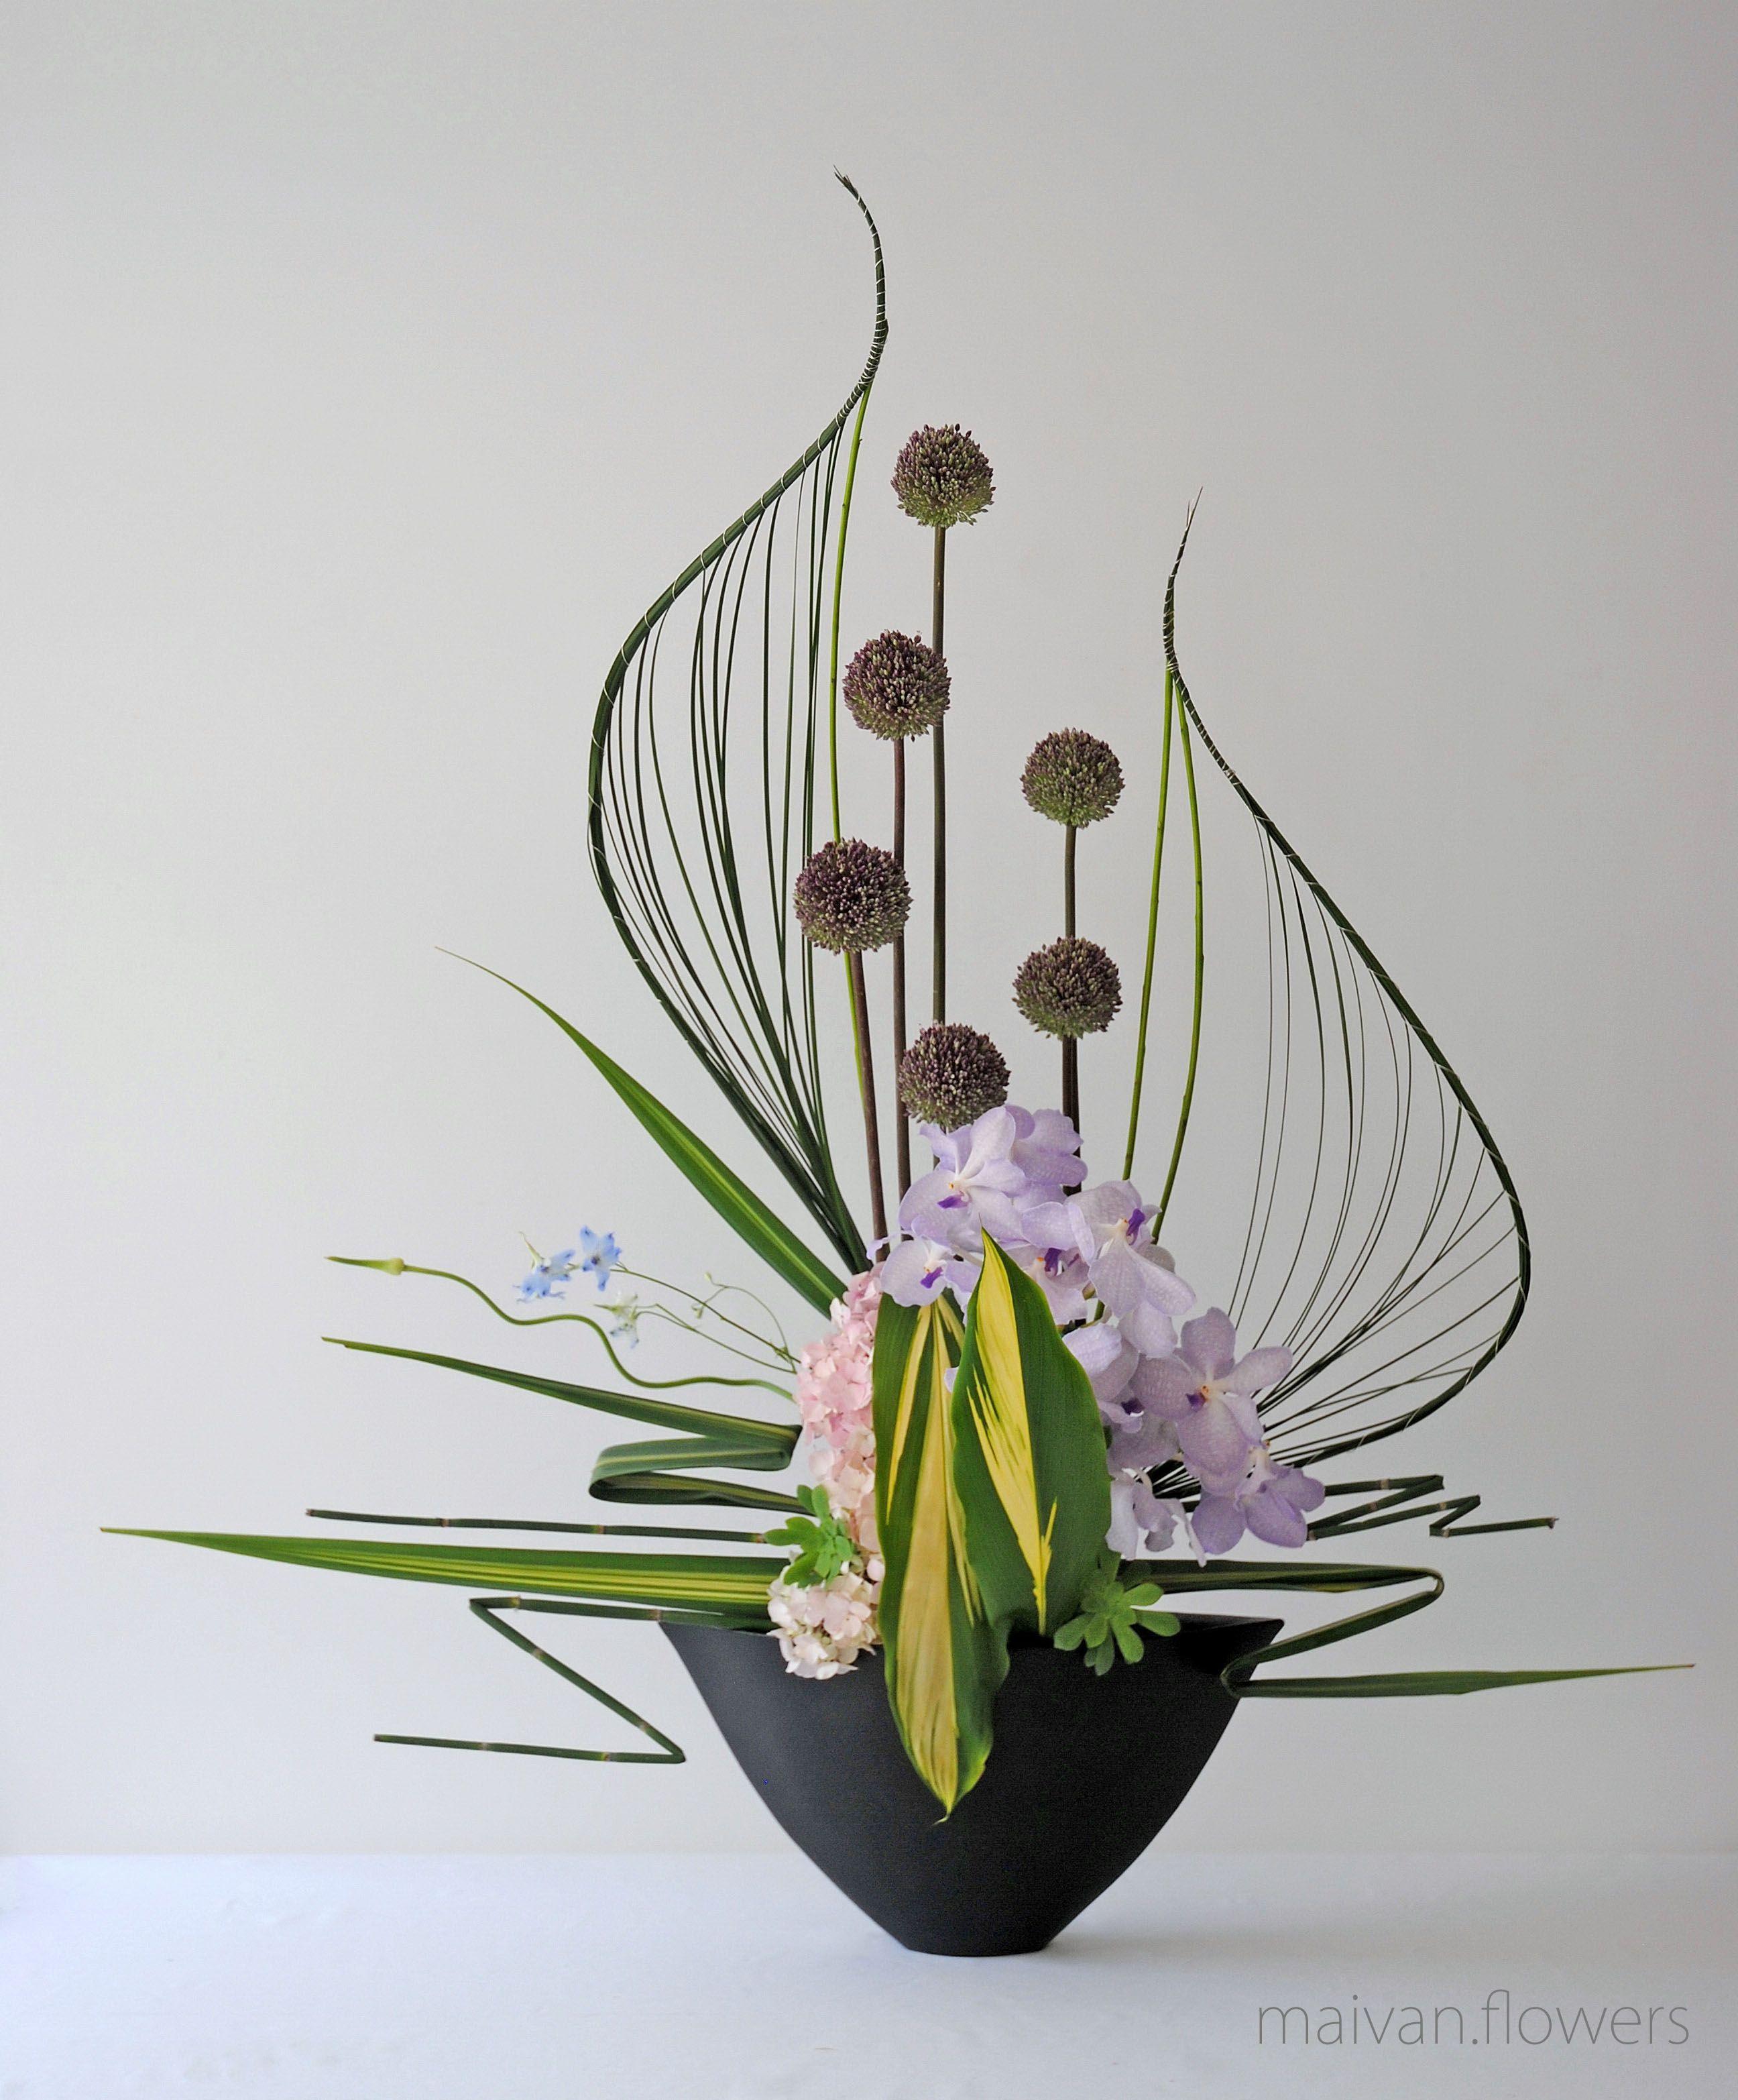 art floral moderne floral design by thai thomas mai van france thai thomas. Black Bedroom Furniture Sets. Home Design Ideas